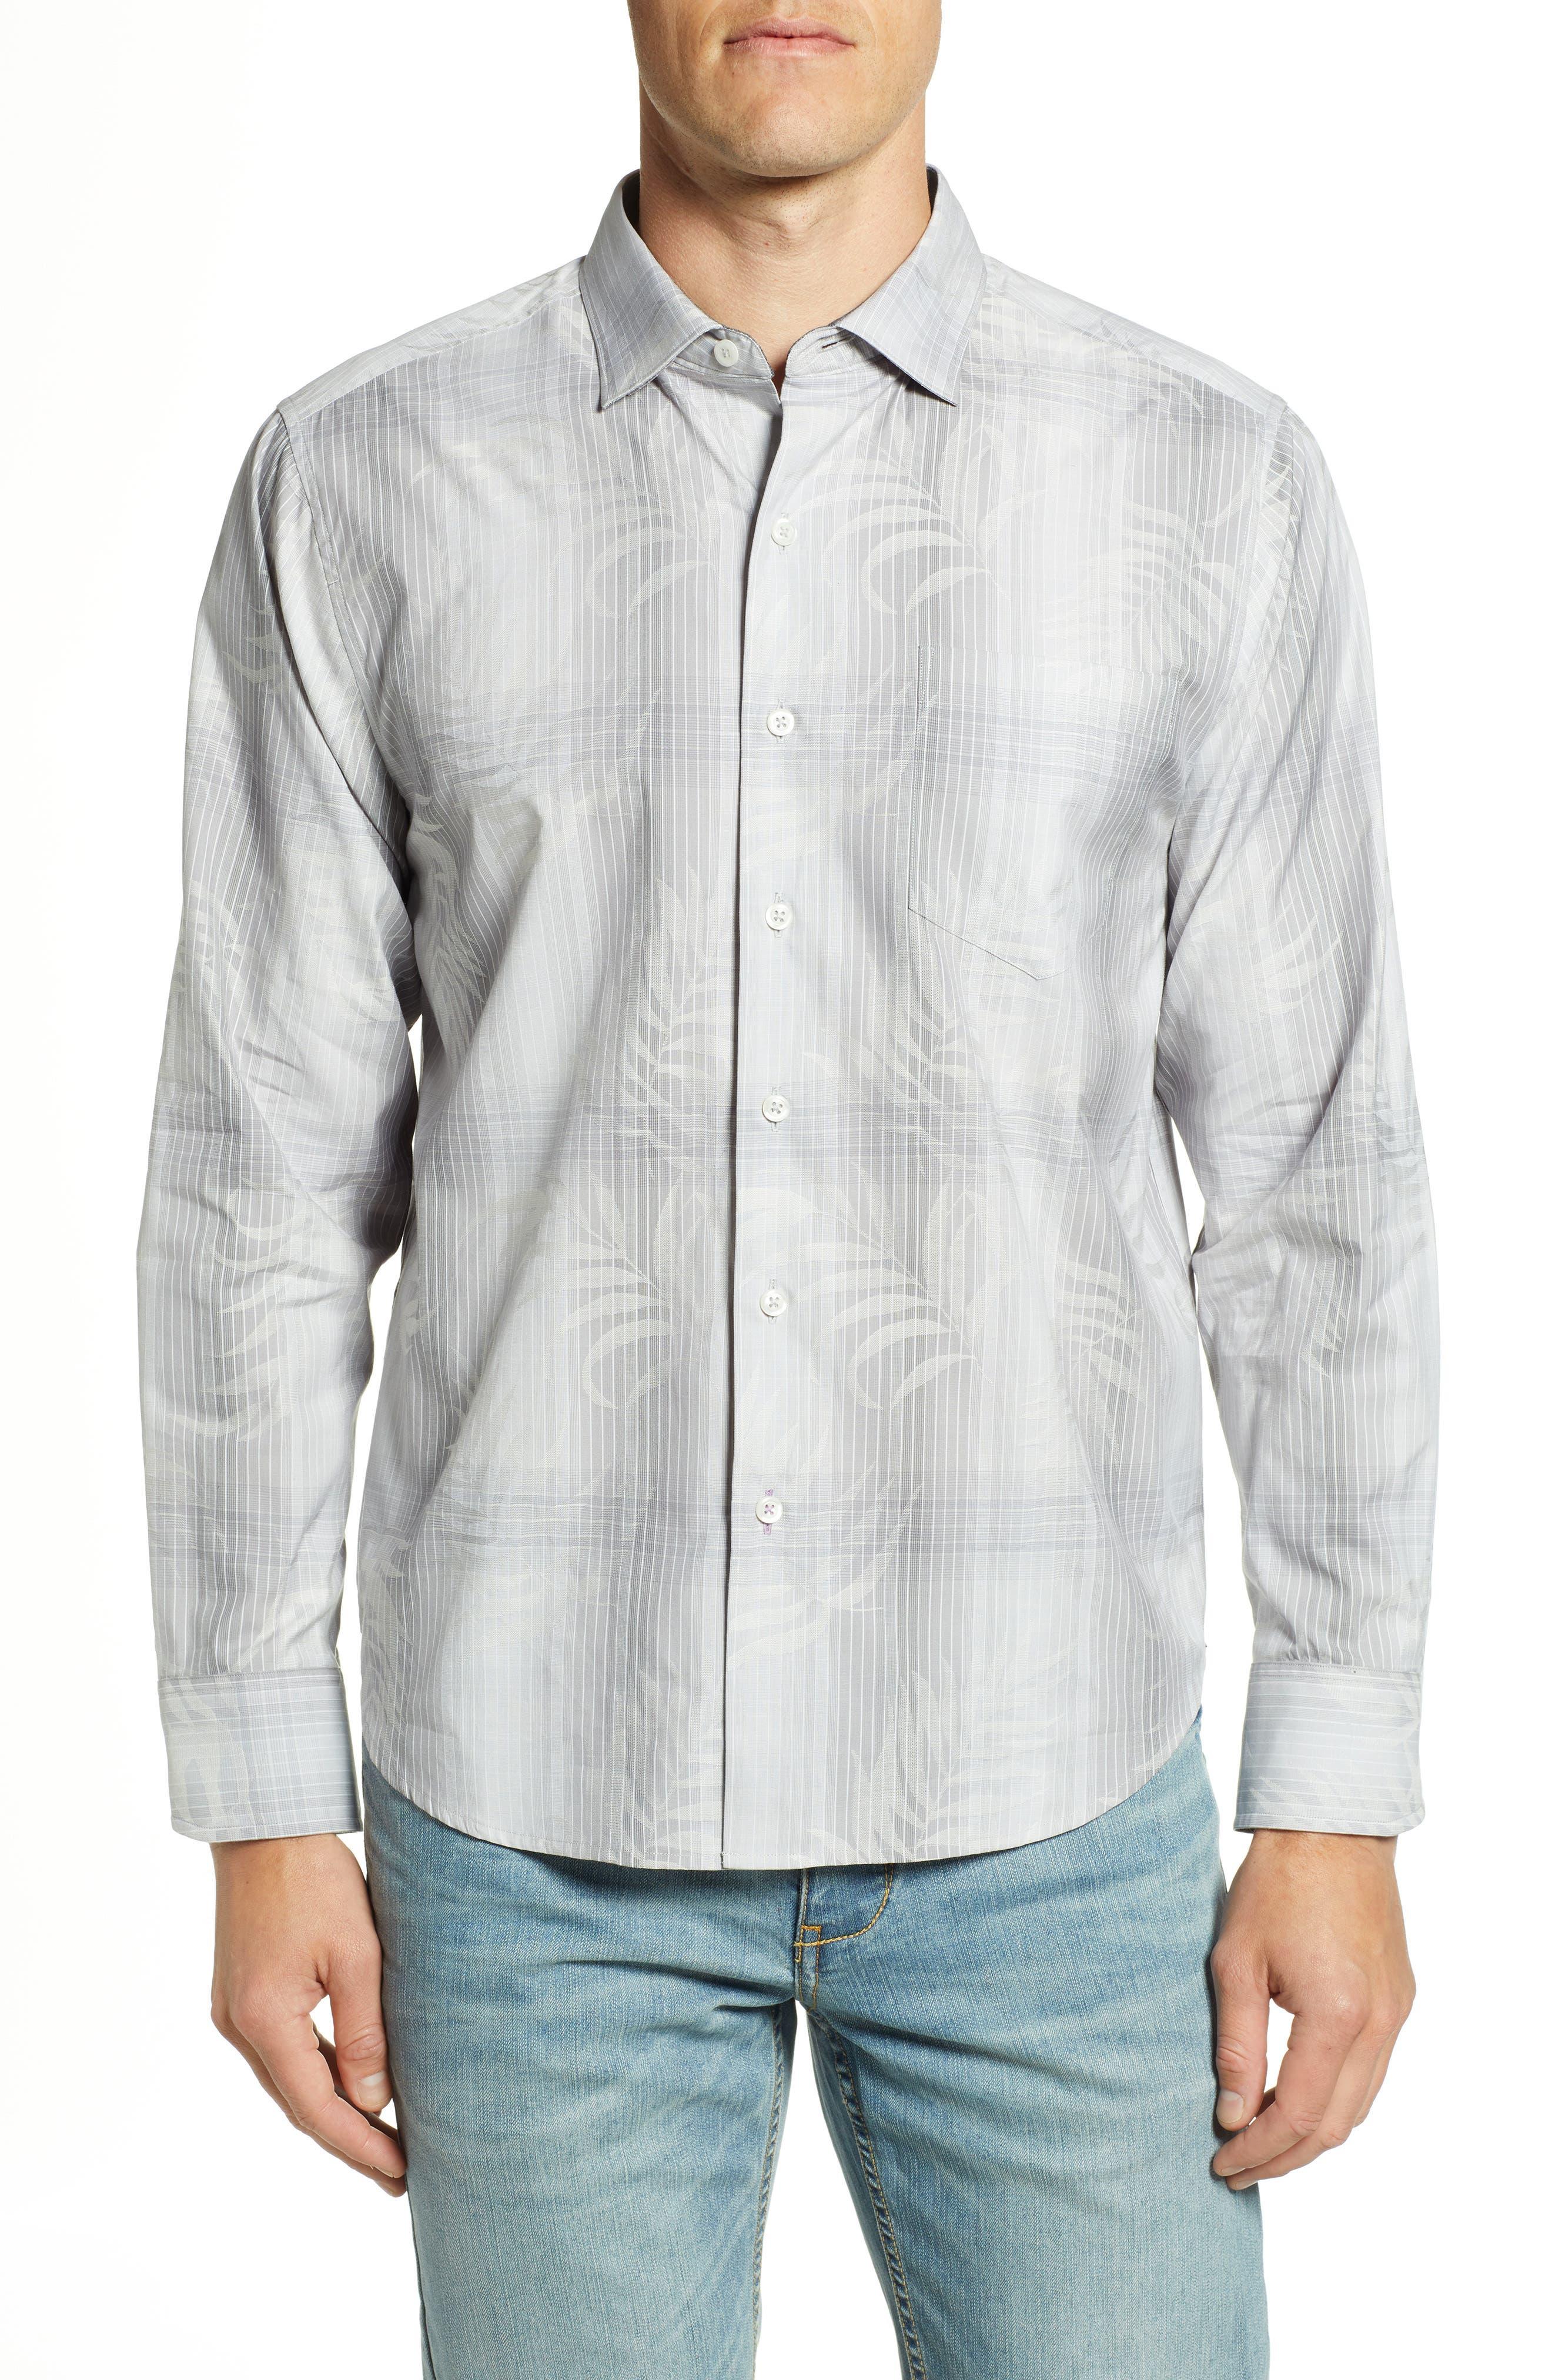 Primo Palms Regular Fit Plaid Sport Shirt,                             Main thumbnail 1, color,                             MICRO CHIP